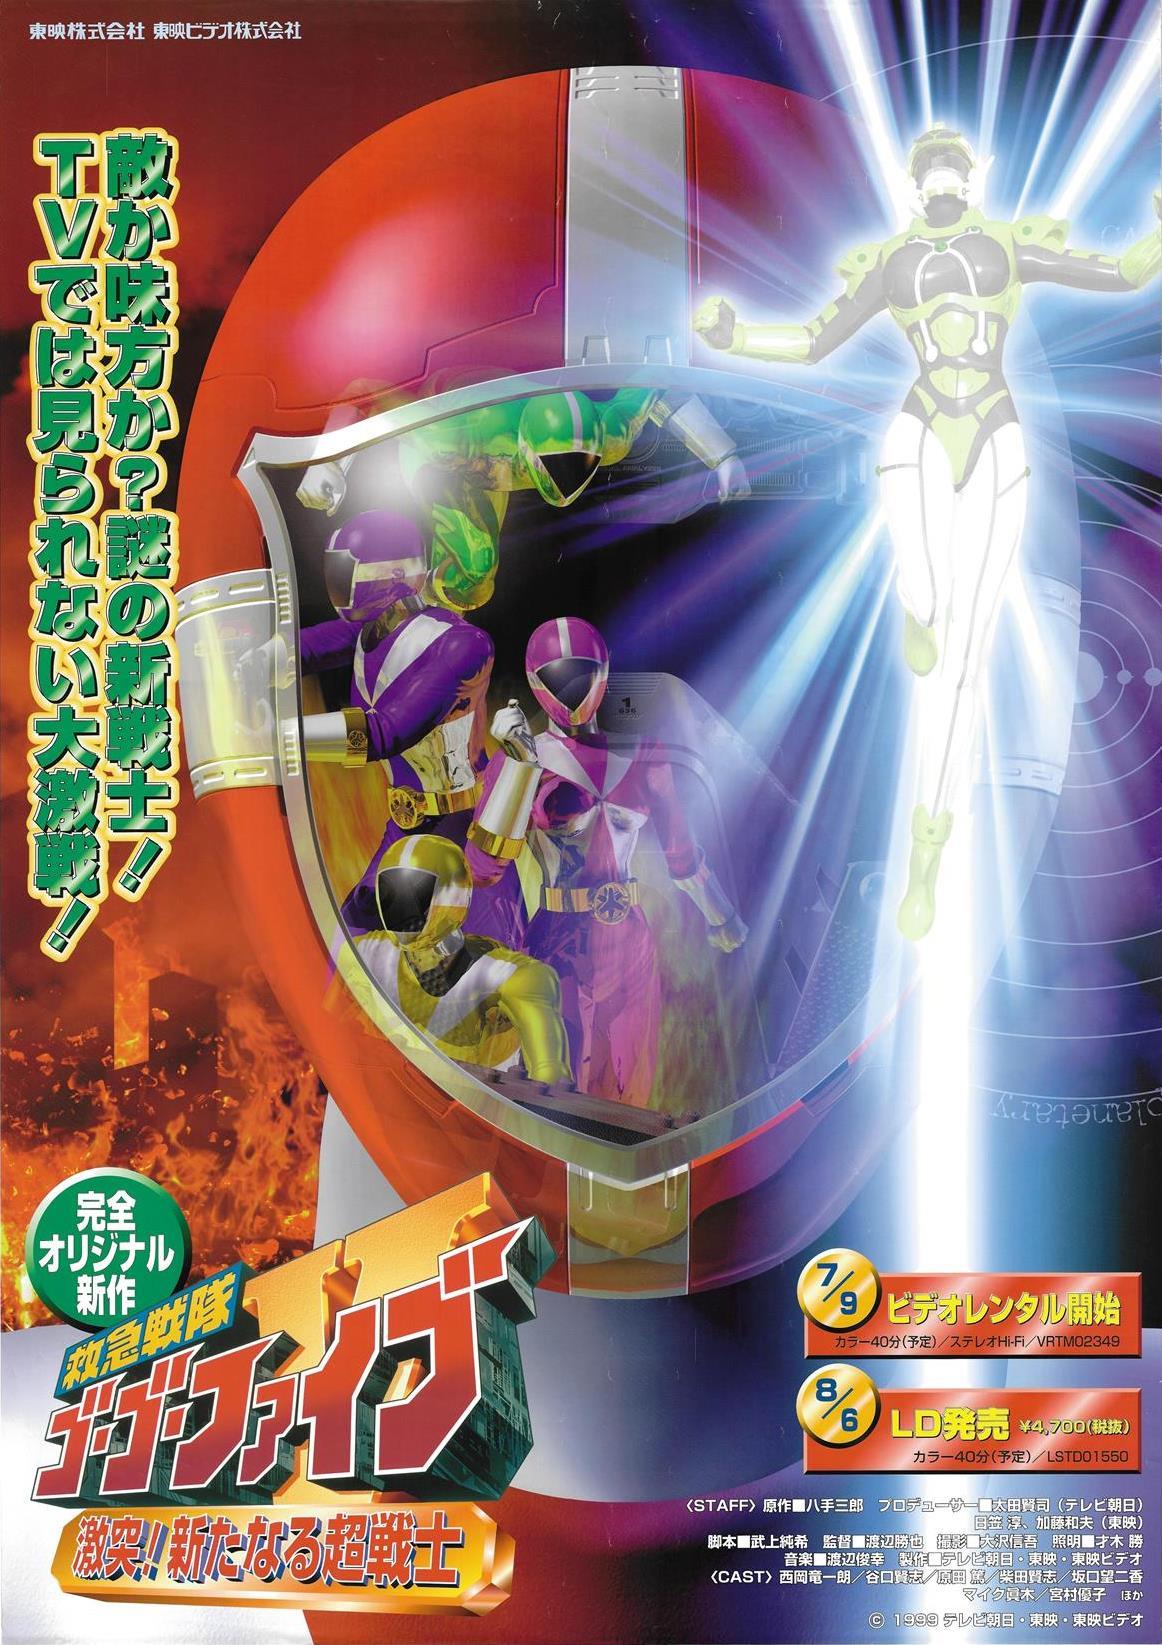 Kyukyu Sentai Gogofive Sudden Shock A New Warrior 2